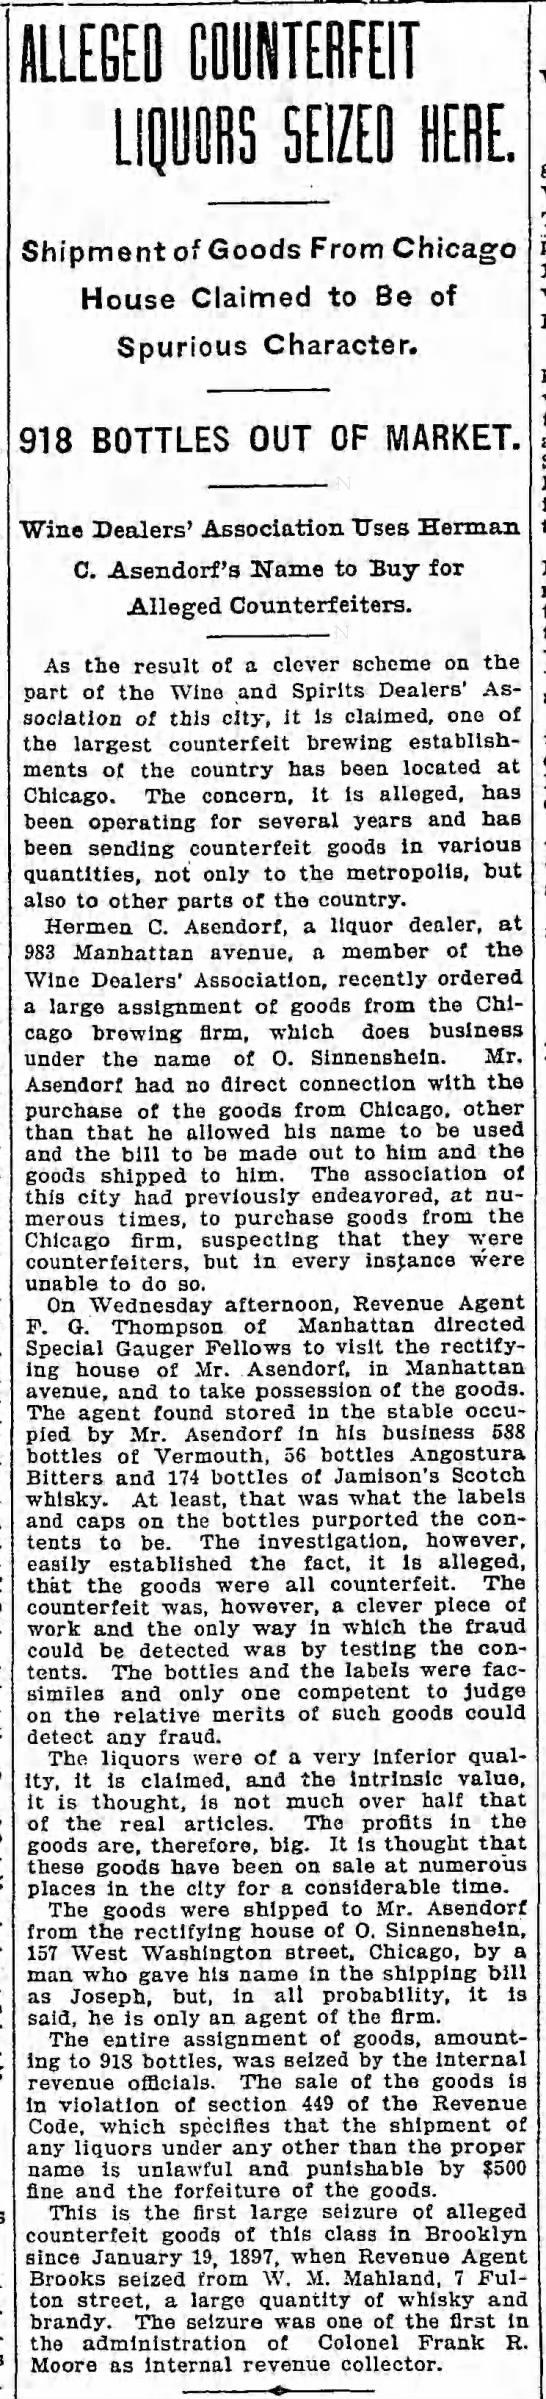 Herman Asendorf, 5 Dec 1901 - ALLEGED MNTERFEIT LIQUORS SEIZED HEBE. Shipment...